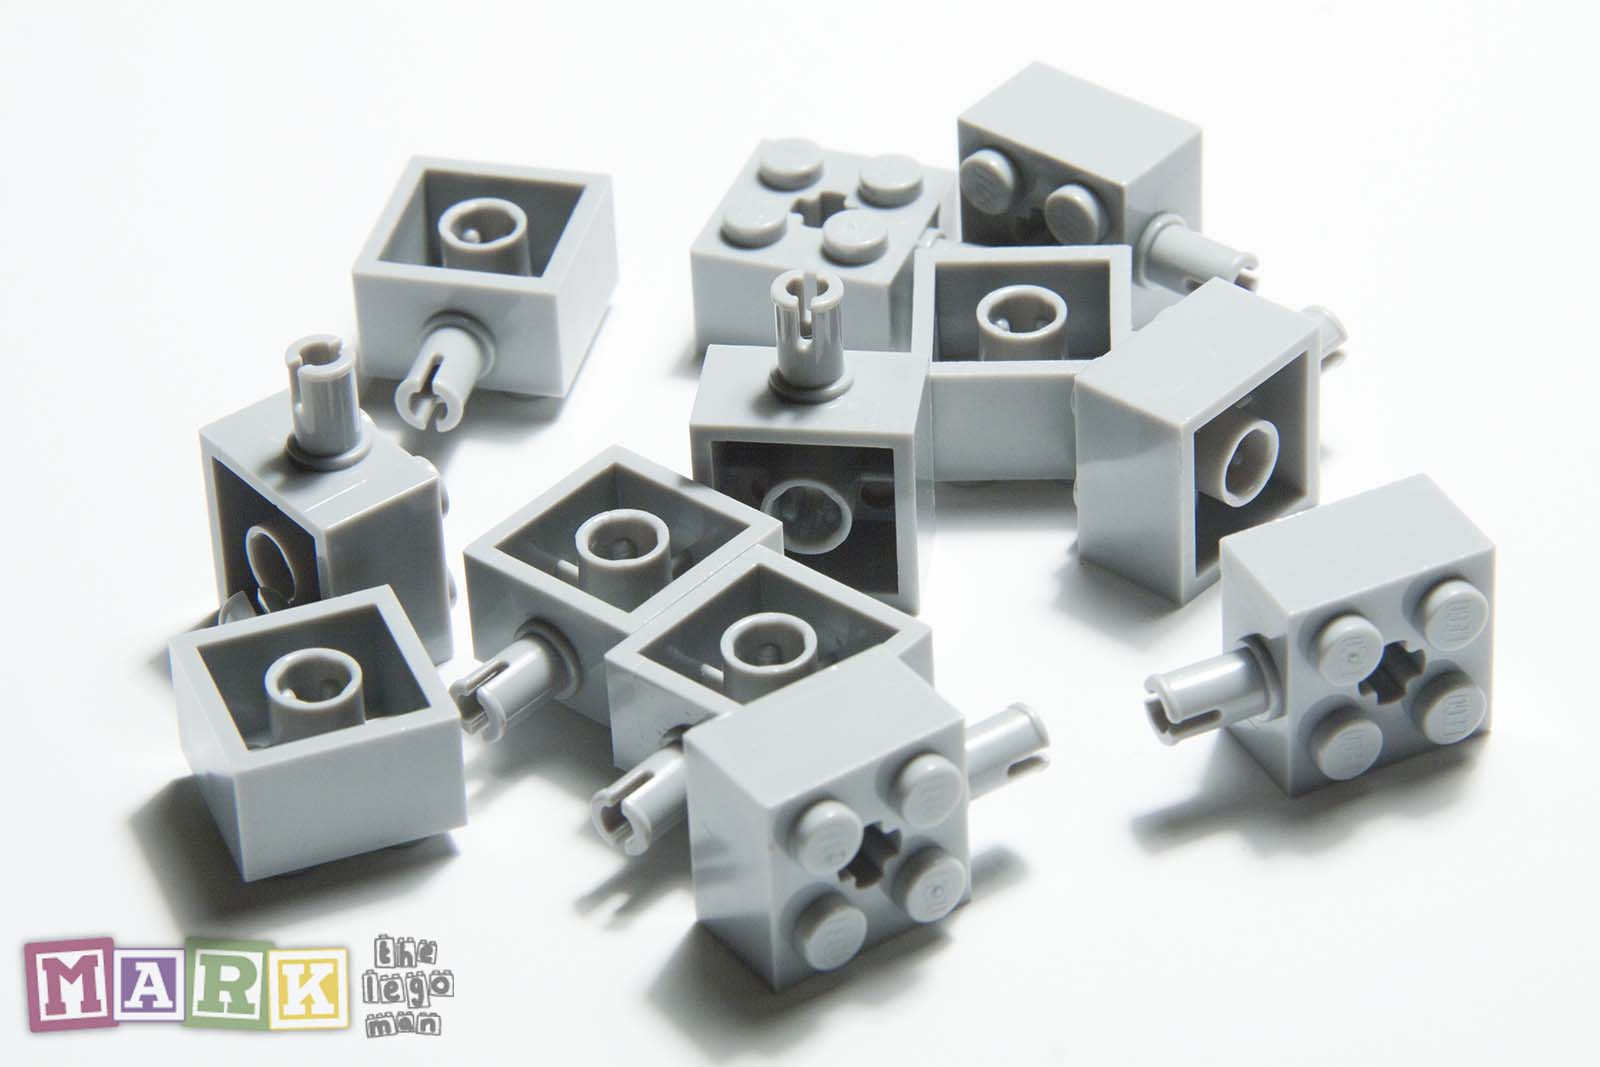 Lego Light Grey Brick 2x2 with Pin Axlehole